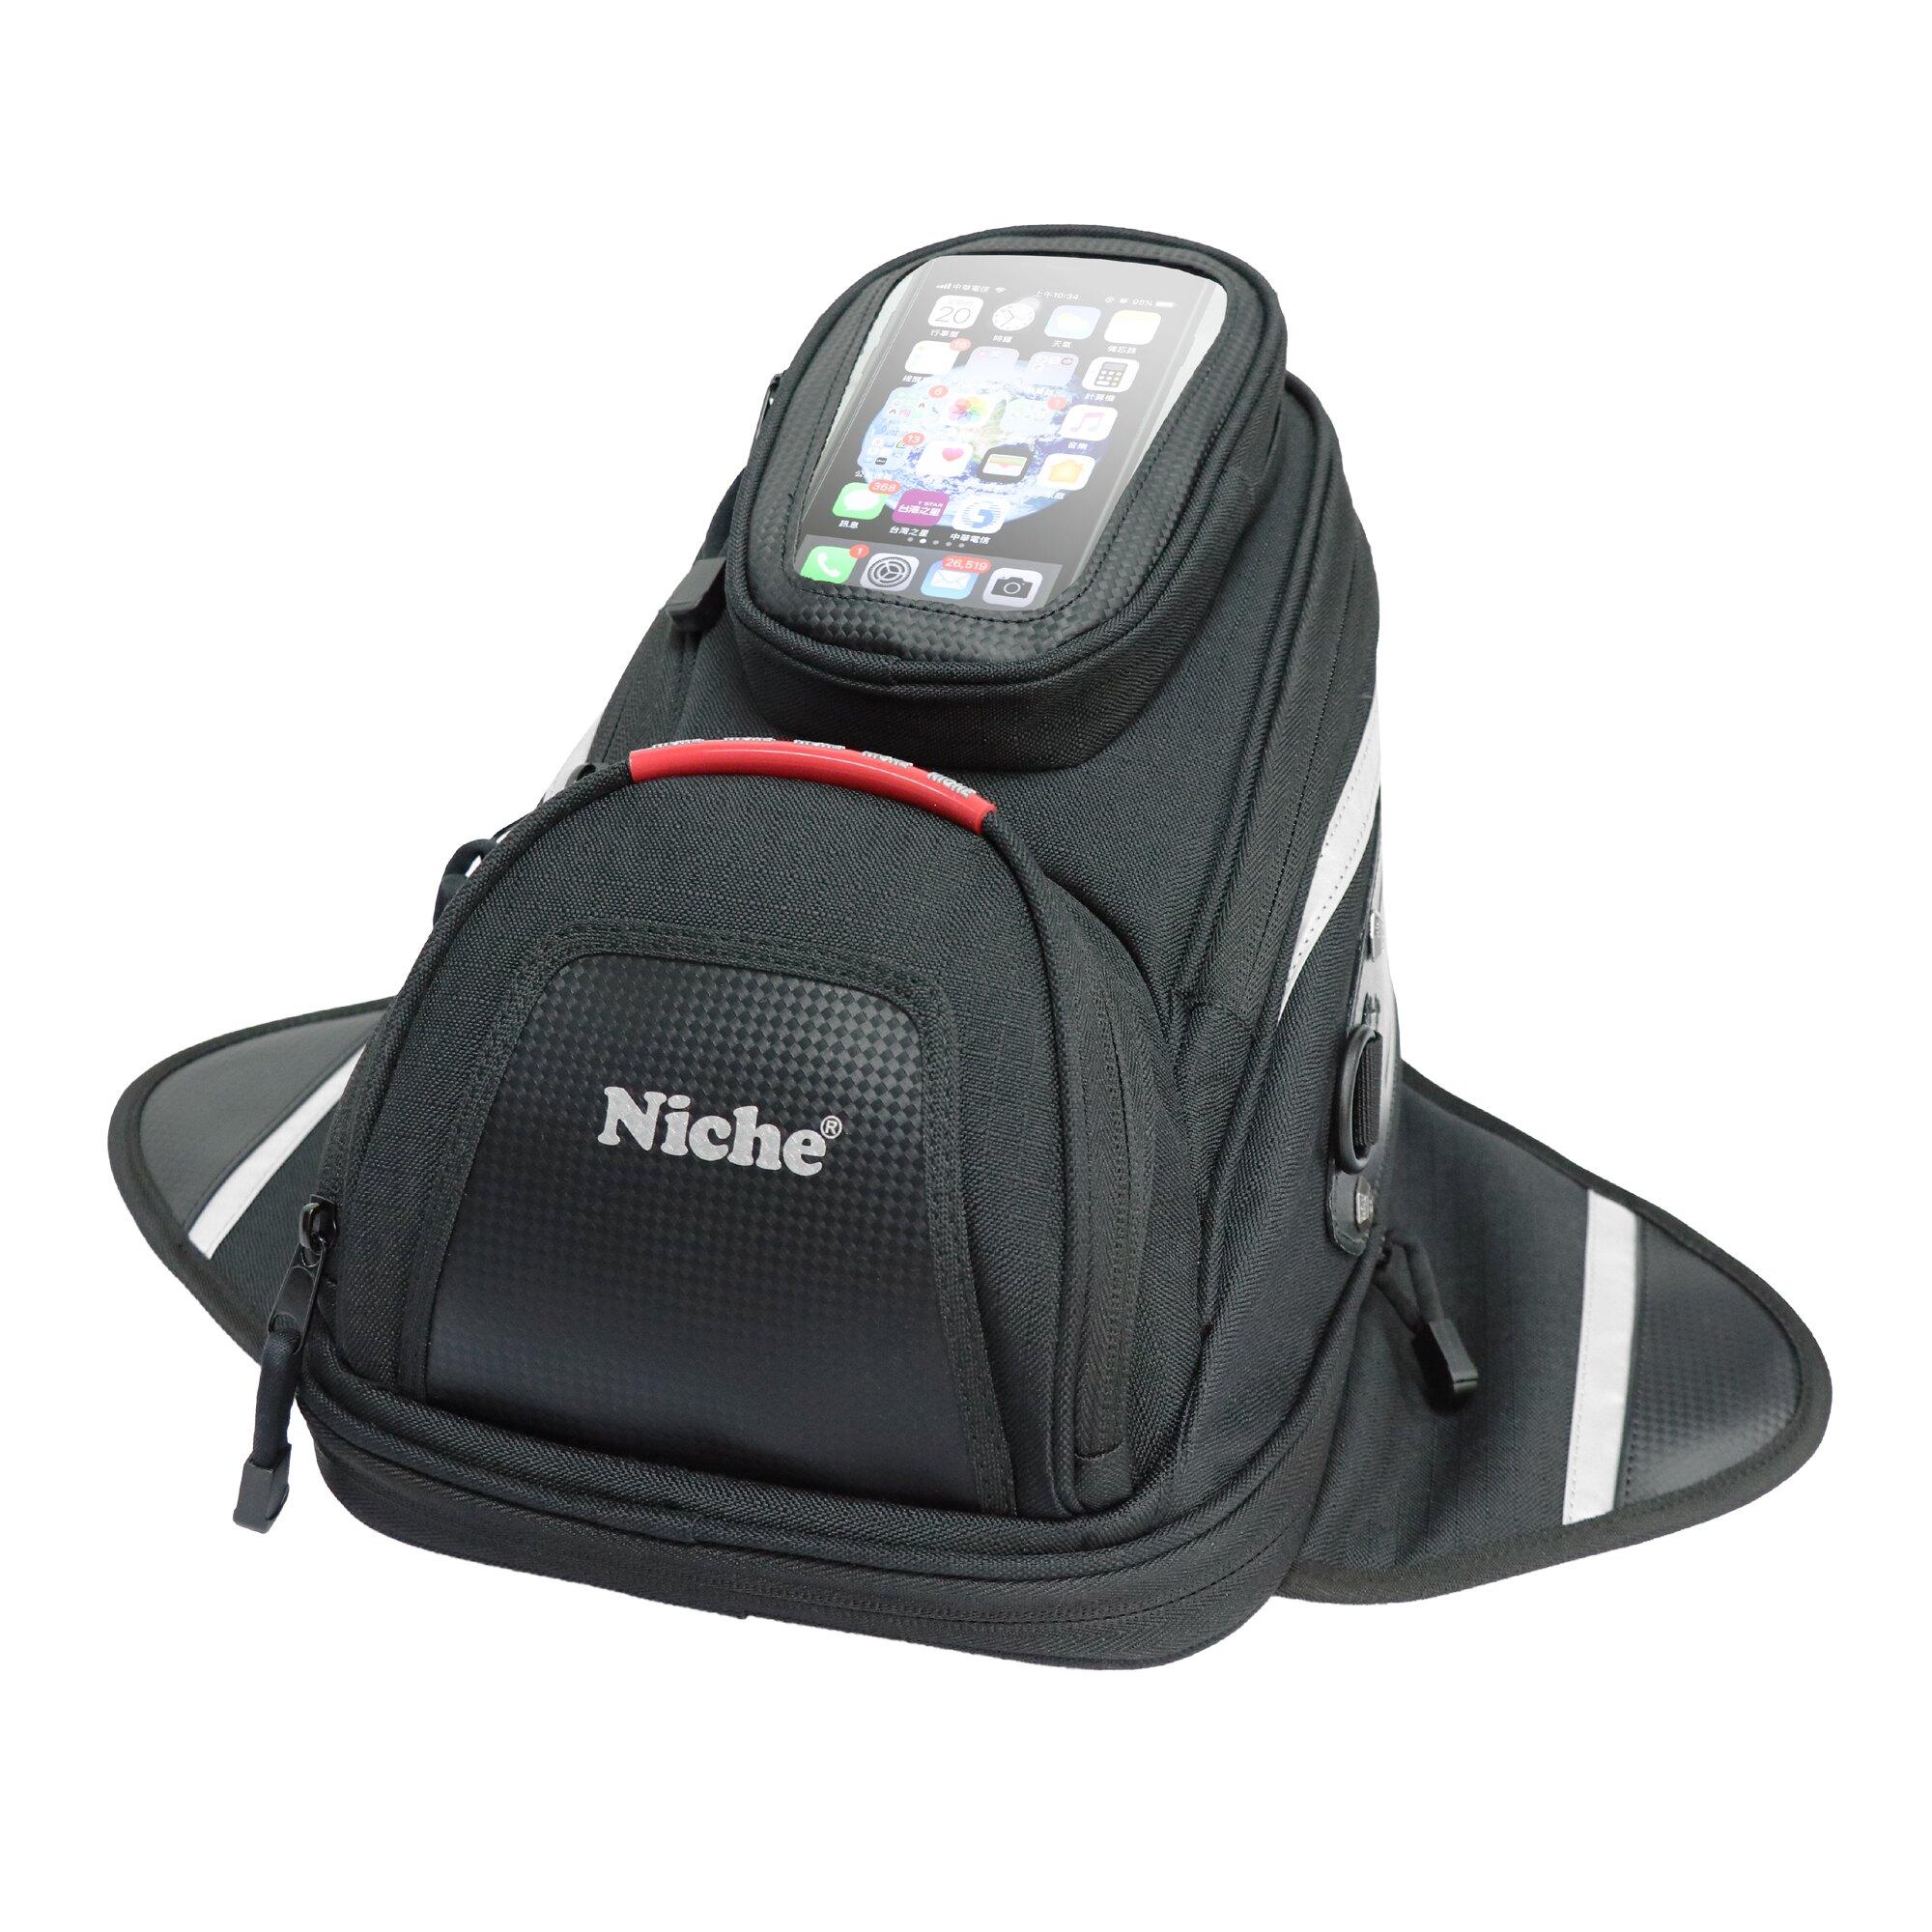 【NMO-2216】Niche 重機車迷你油箱袋 蝶形油箱包 油箱袋 騎士包 肩背包 手提包